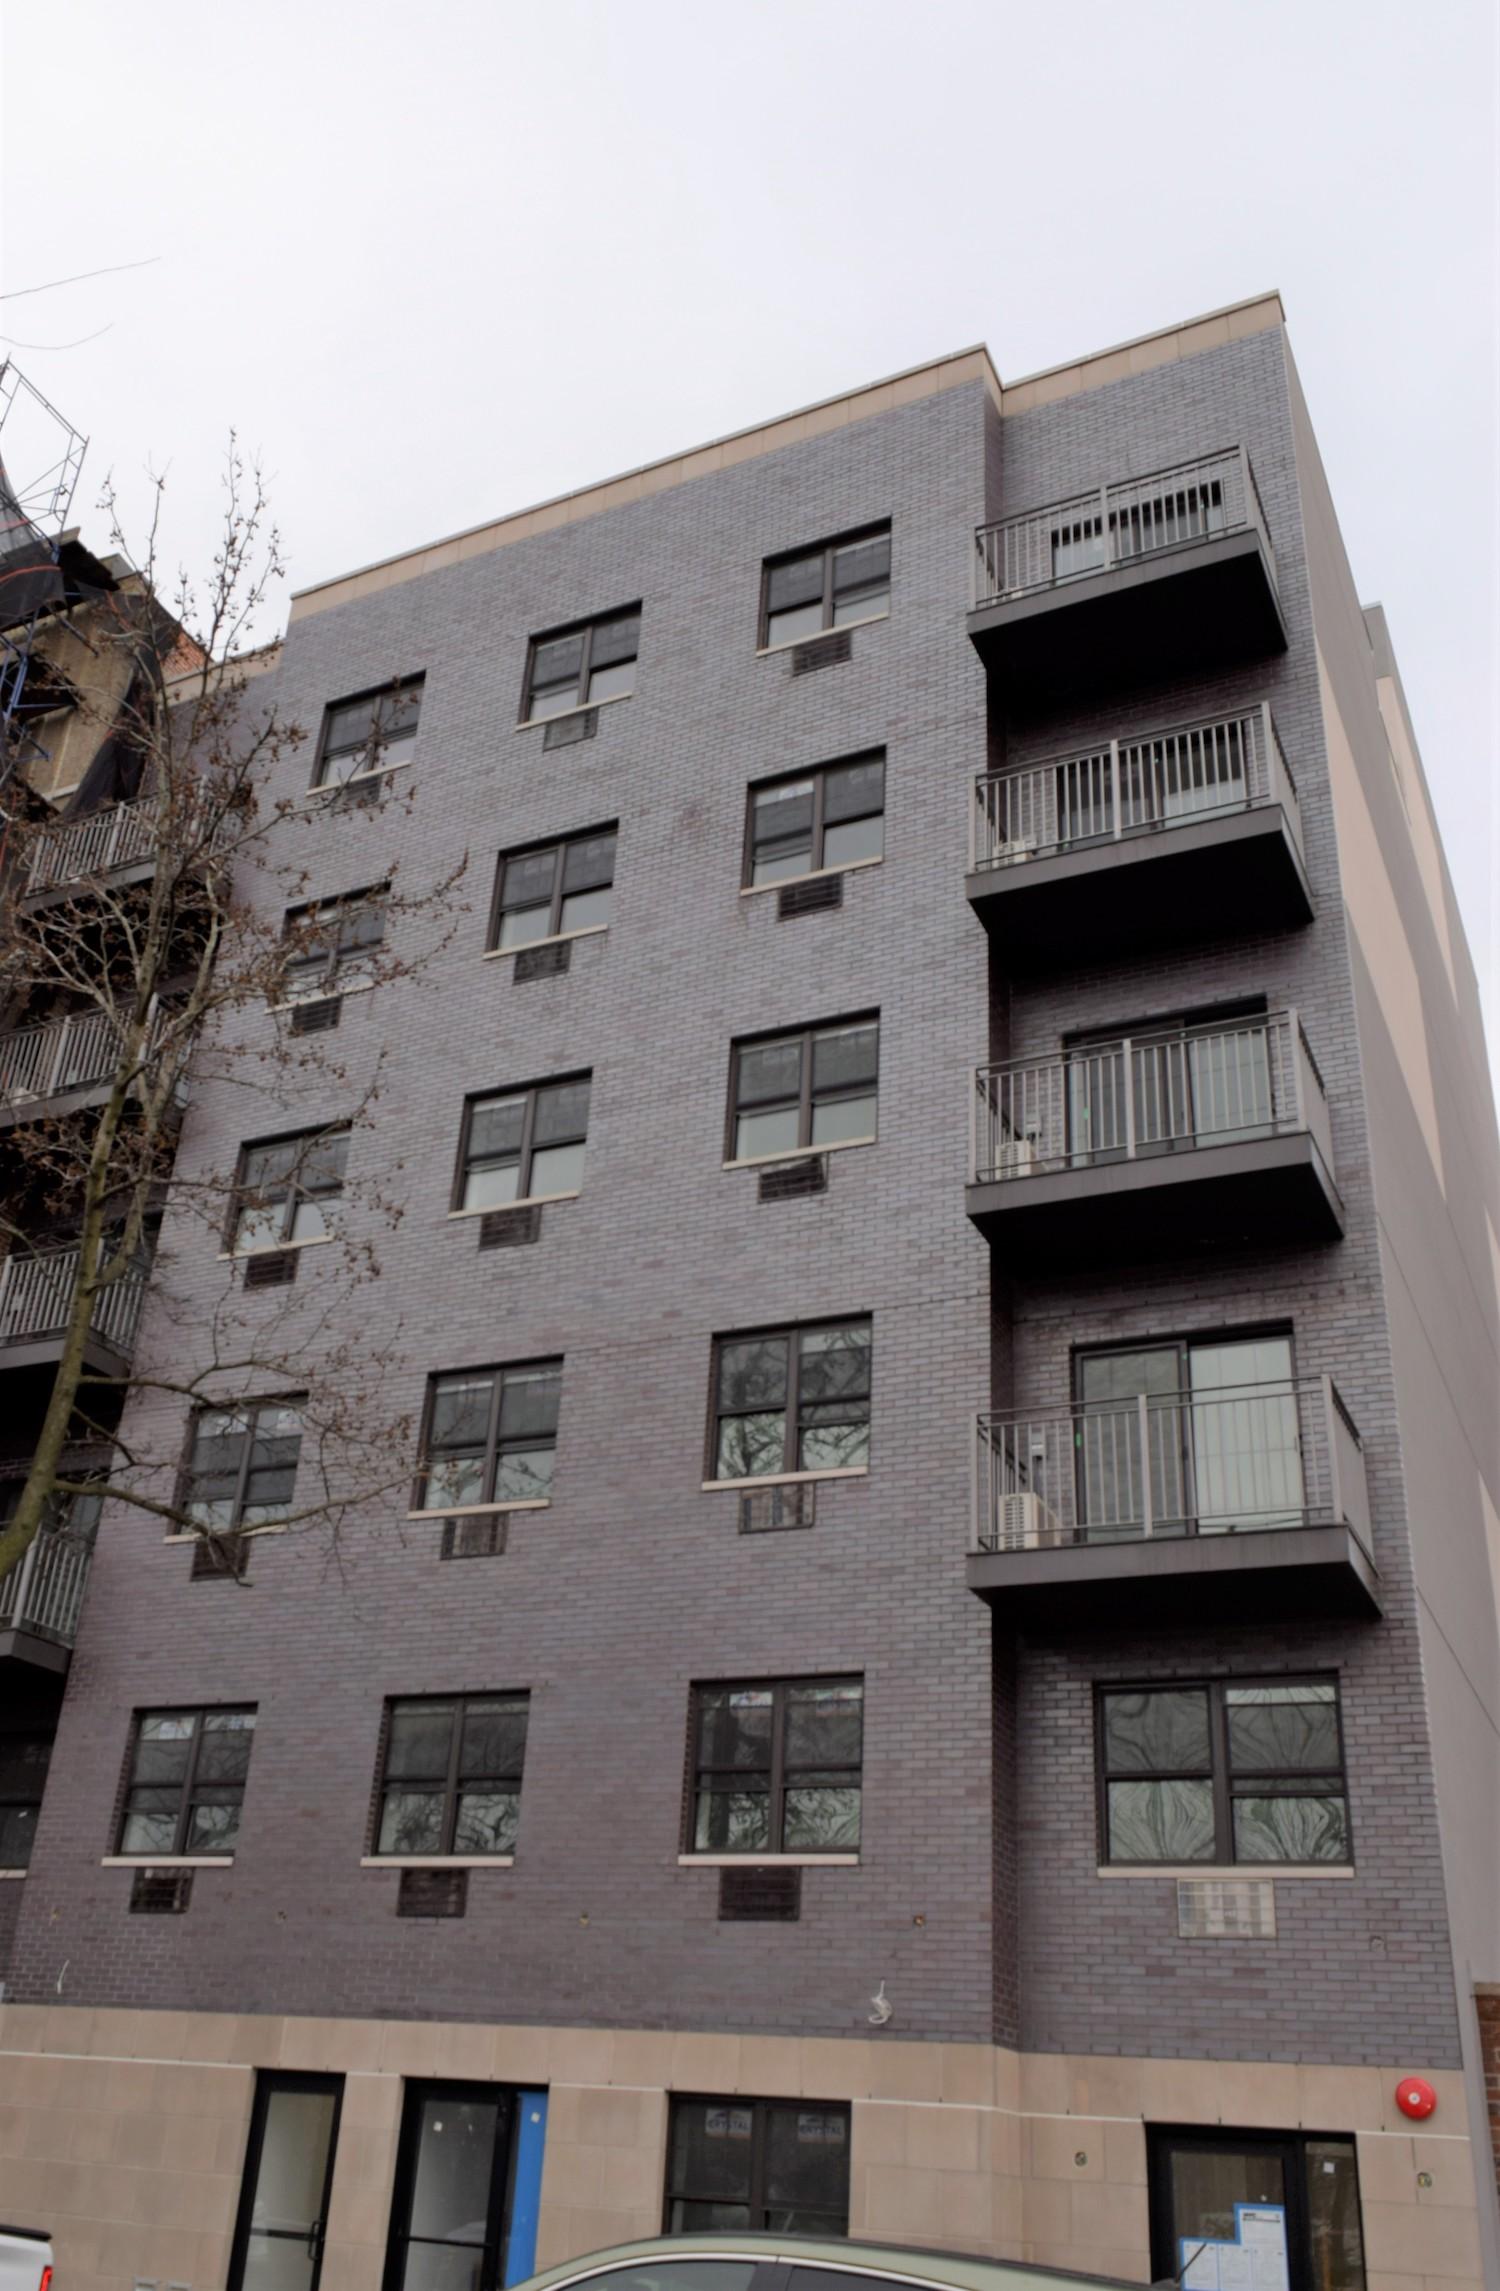 2115 Burr Avenue in Pelham Bay, The Bronx